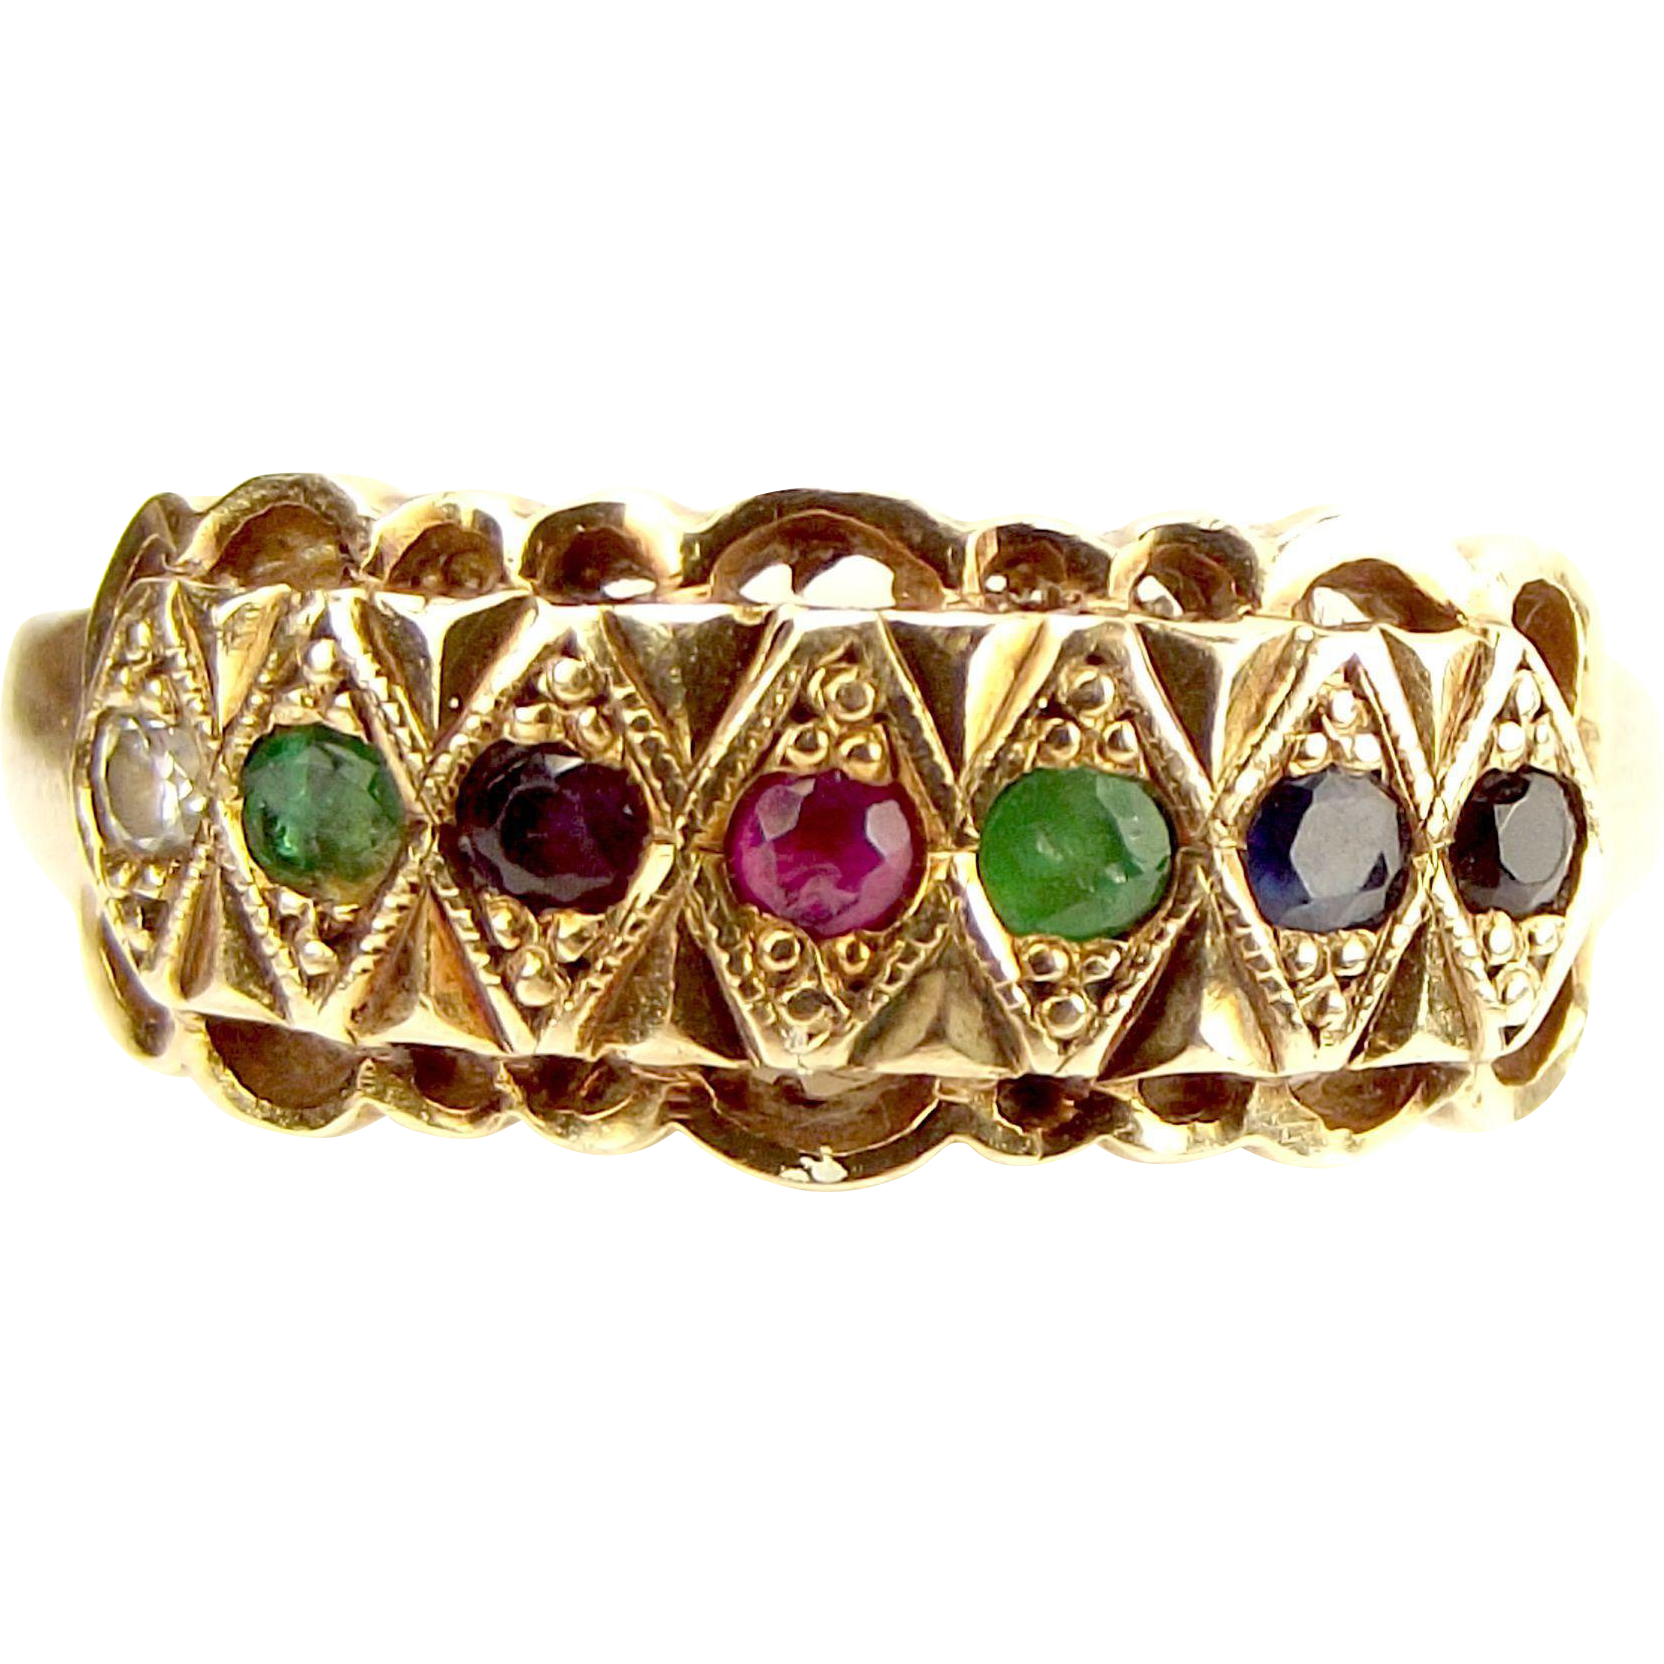 vintage 9ct gold dearest gem set ring 1910 s 1920 s from